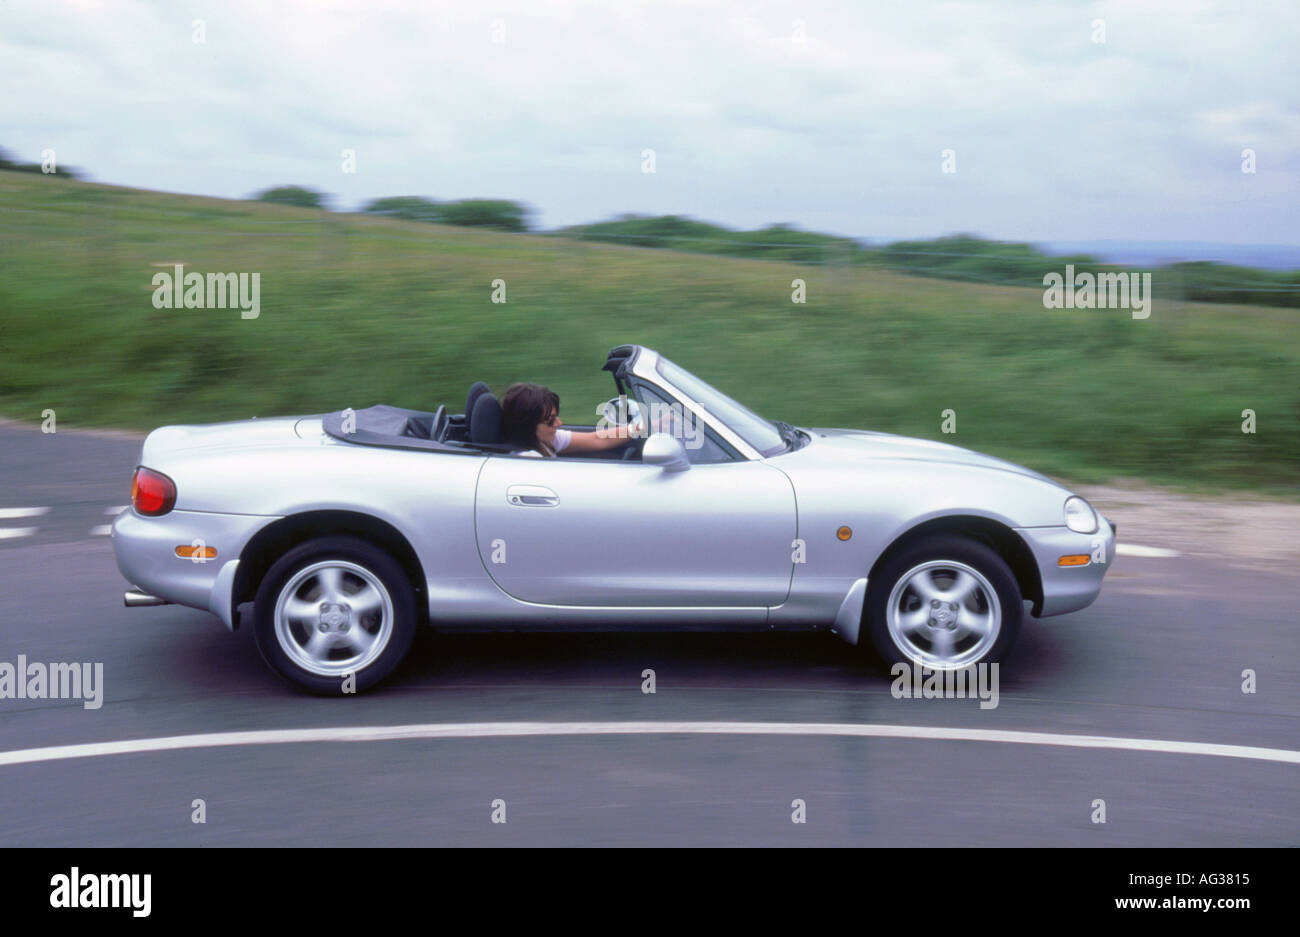 Kelebihan Kekurangan Mazda 1999 Murah Berkualitas